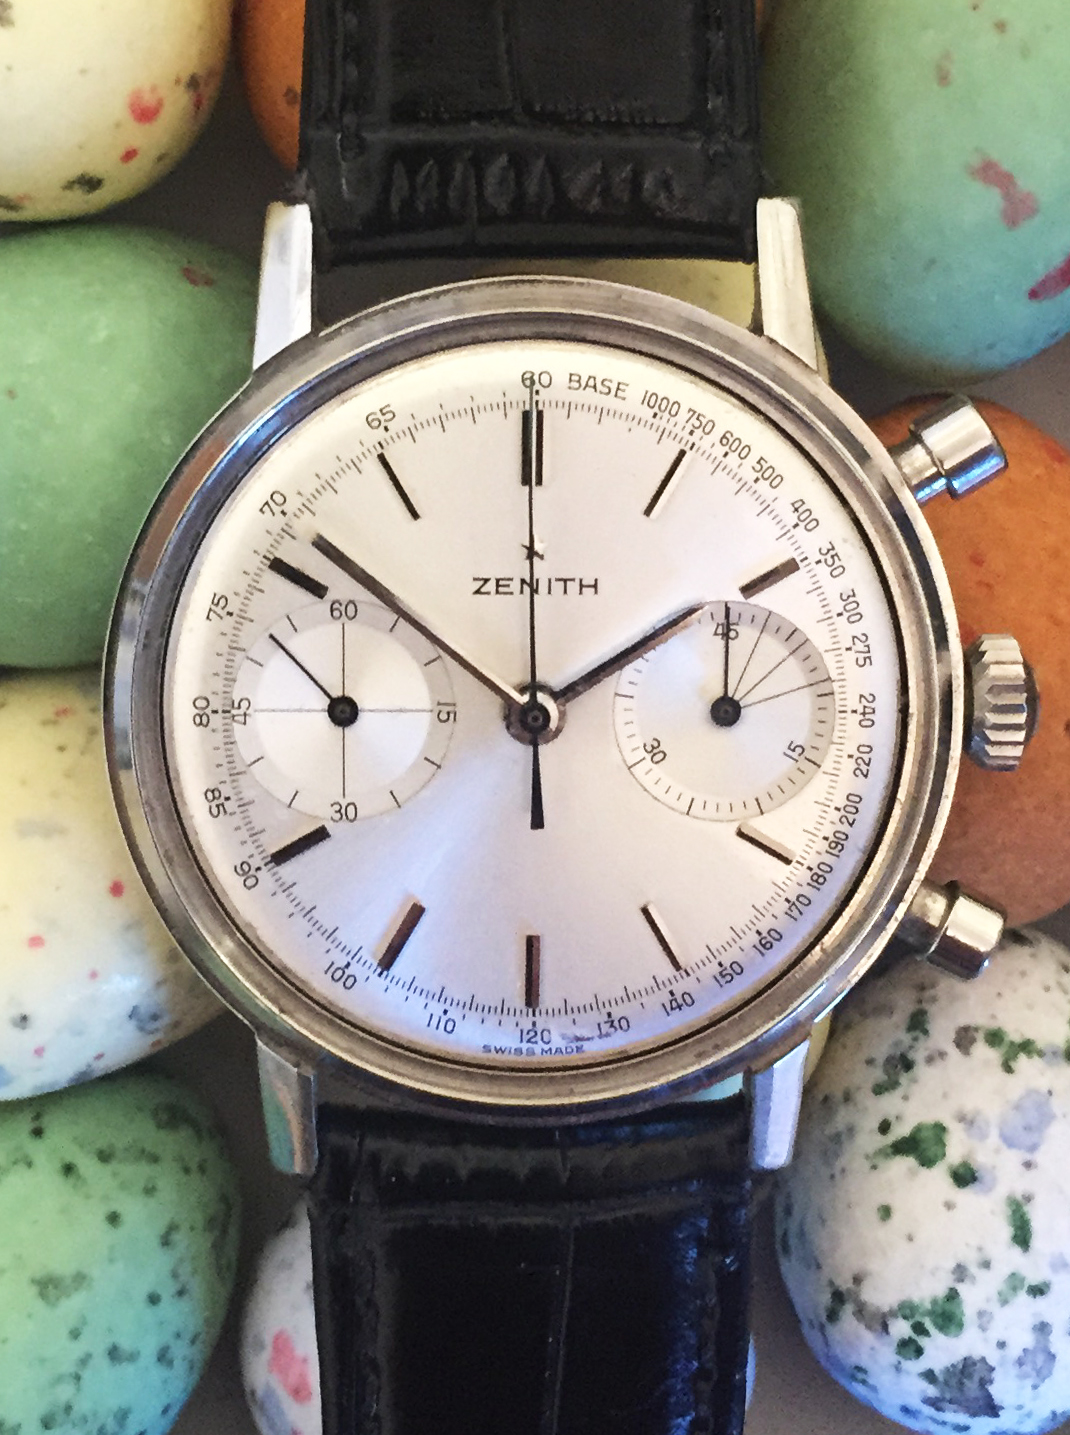 Zenith chronograph